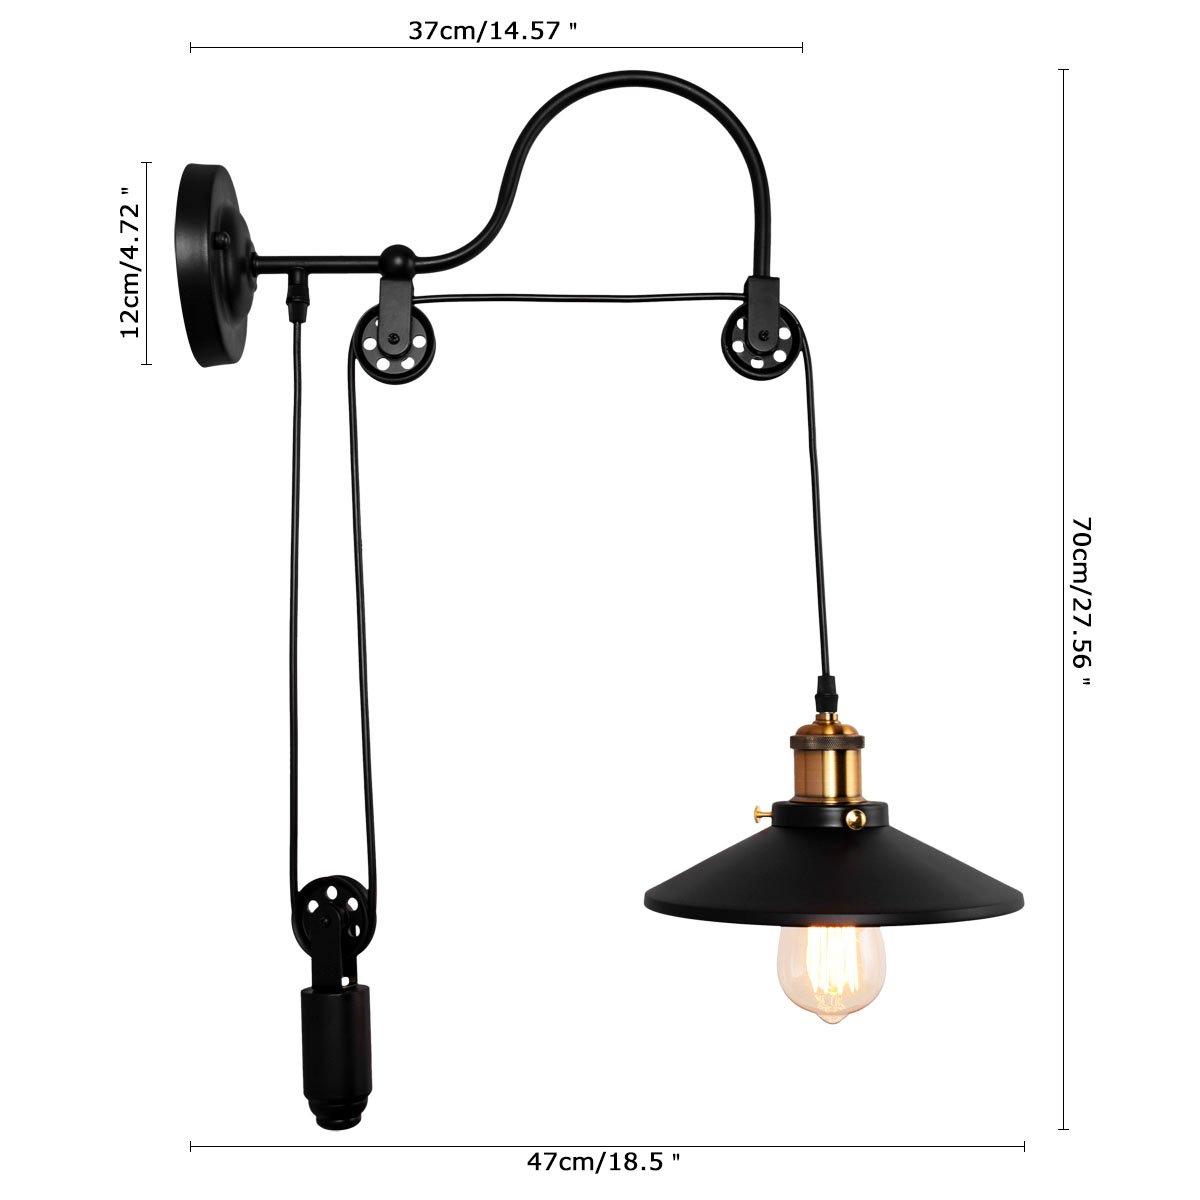 Lingkai industrial wall sconces adjustable 1 light gooseneck wall light pulley wall mounted wheel wall lamp